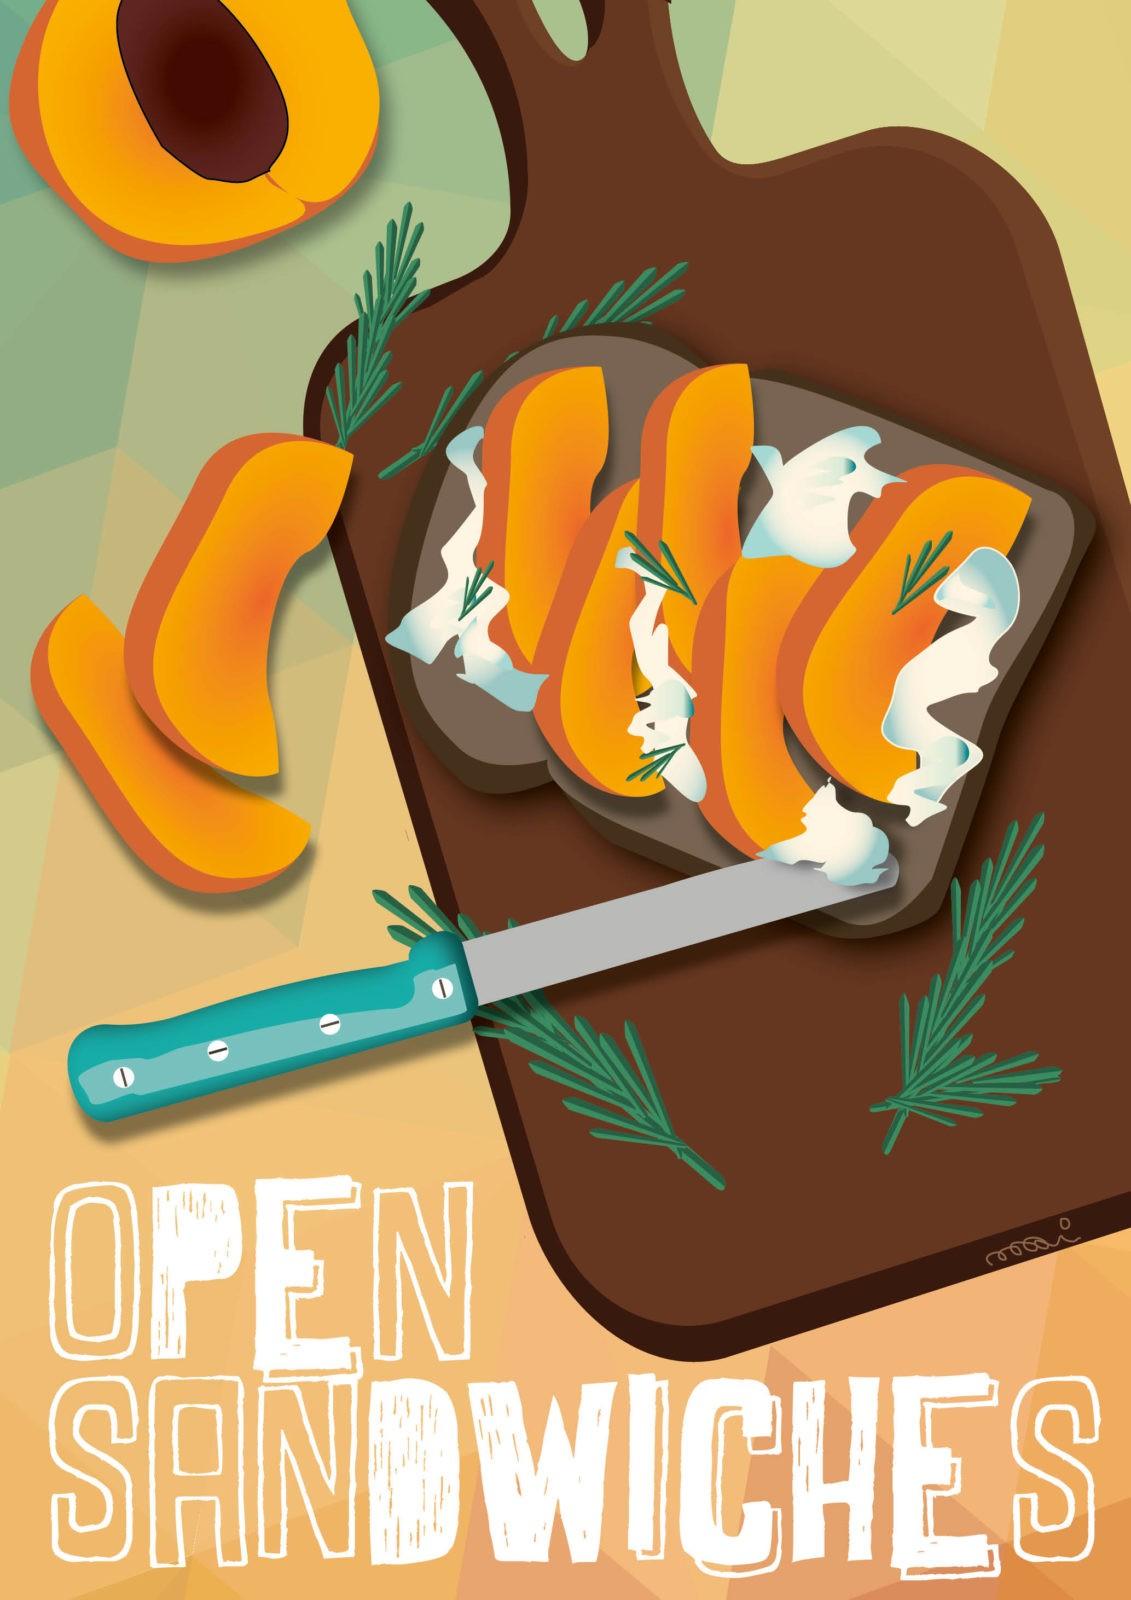 baner opensandwiches